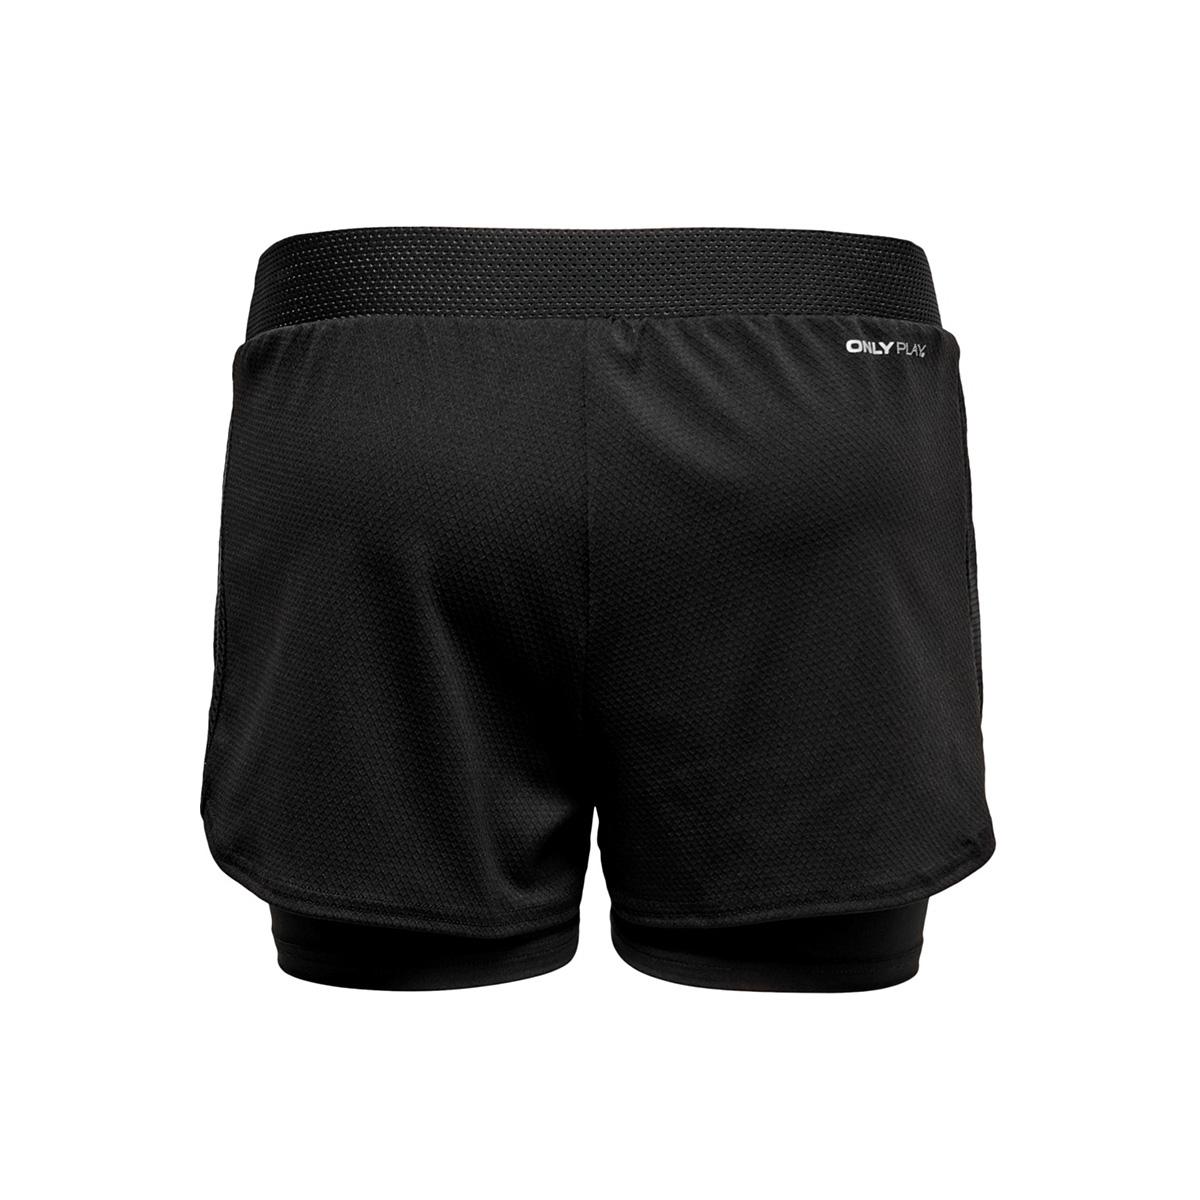 onpjoelle loose training shorts 15175693 only play sport short black/w. black